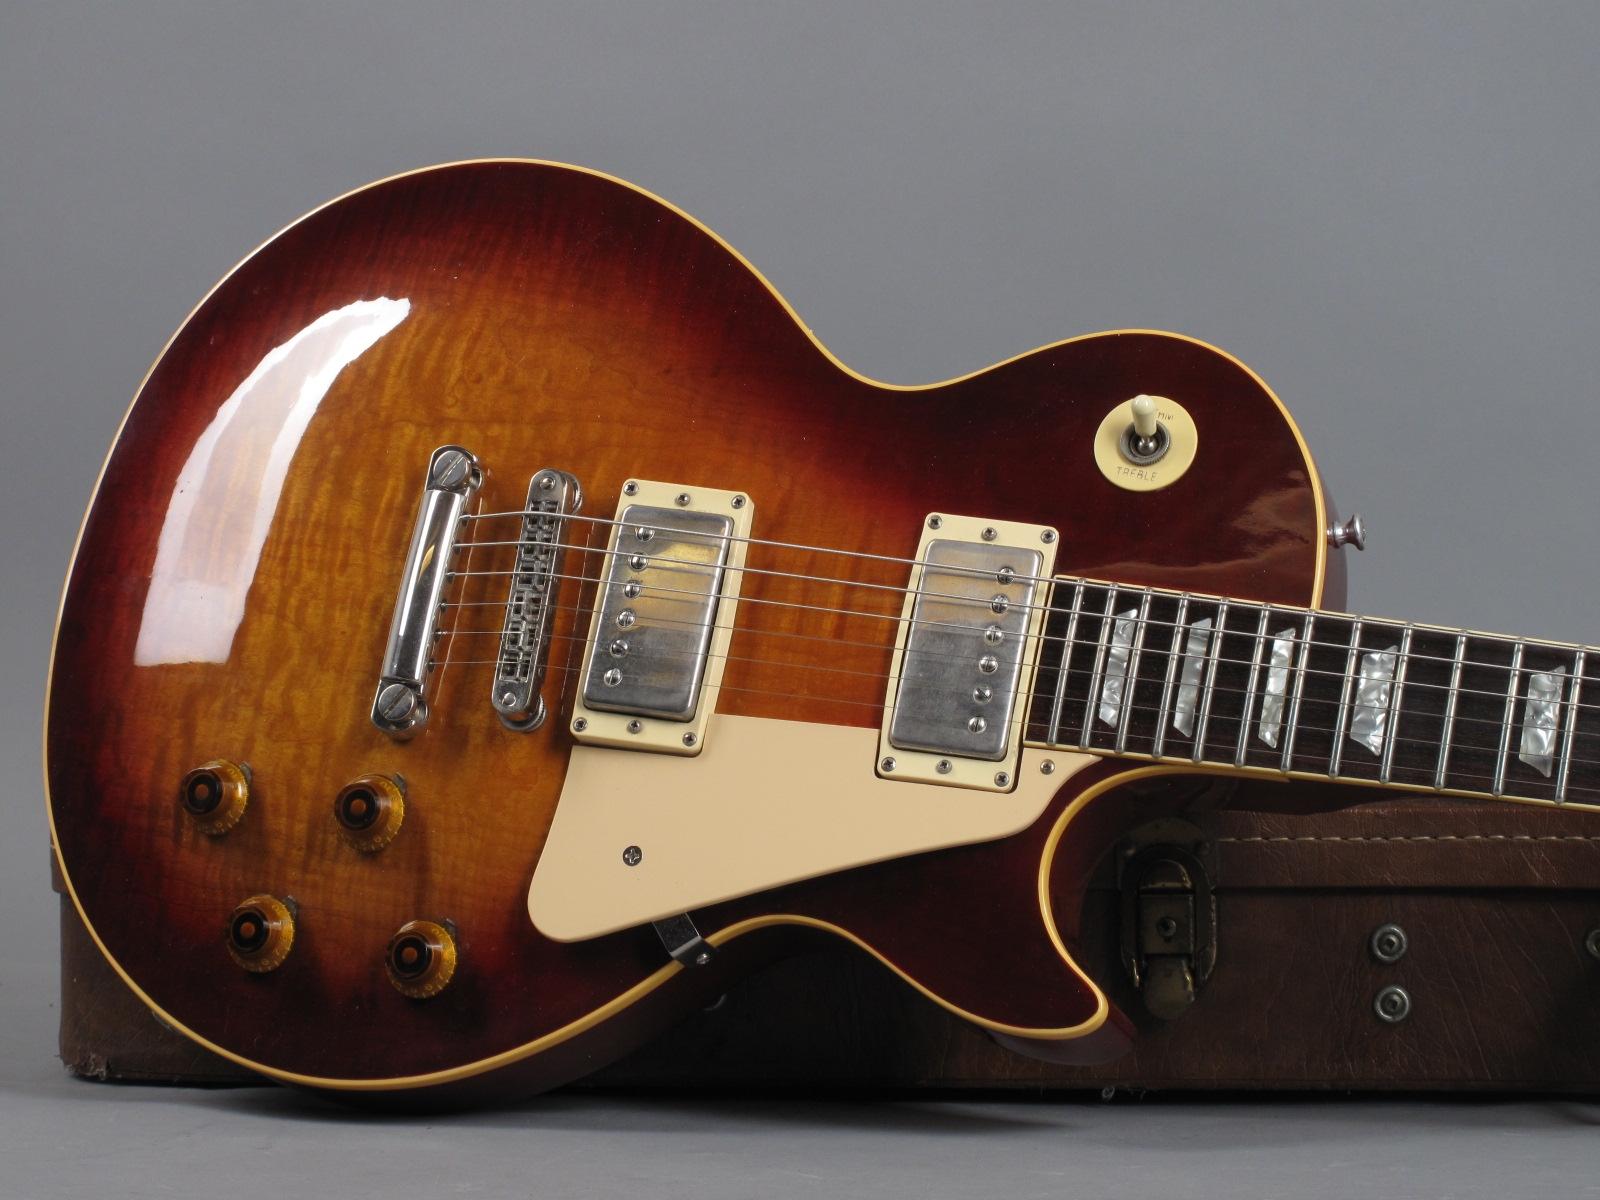 https://guitarpoint.de/app/uploads/products/1982-gibson-les-paul-heritage-80-heritage-cherry-sunburst/1982-Gibson-Les-Paul-Heritage-80-82082562_19.jpg